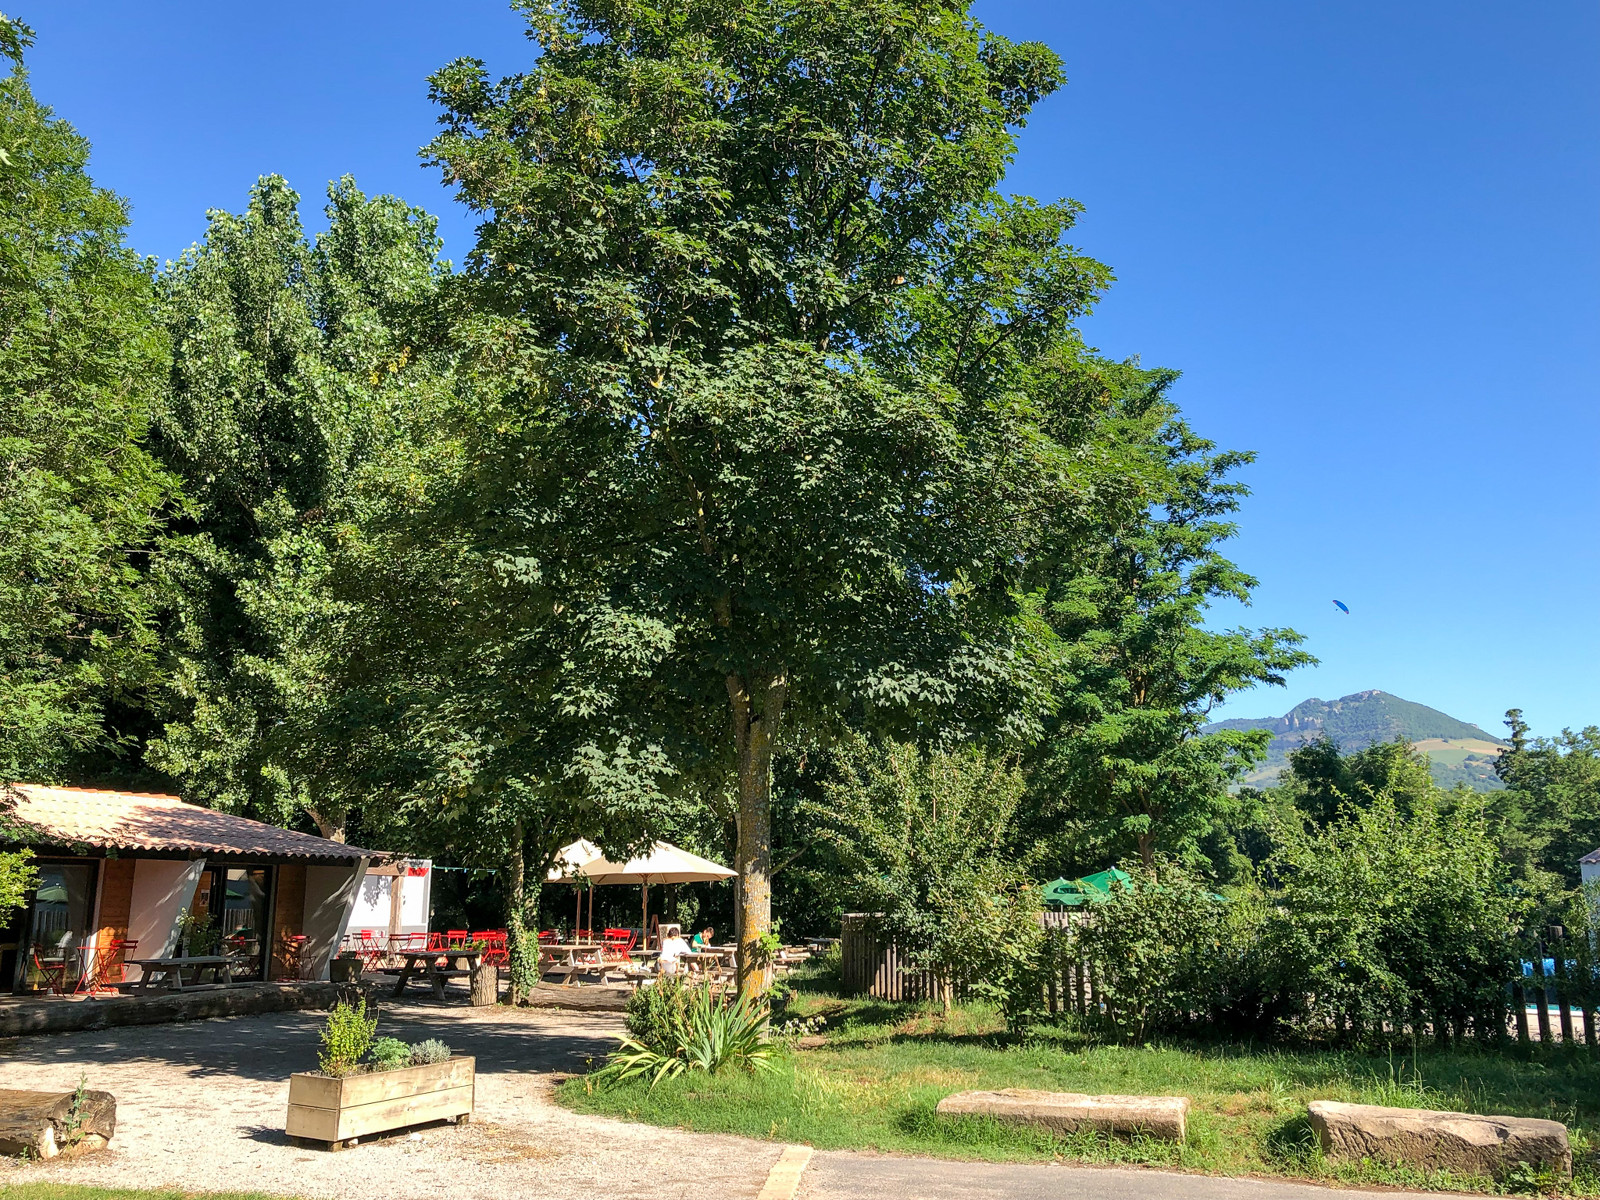 Camping Huttopia Millau, Millau, Aveyron